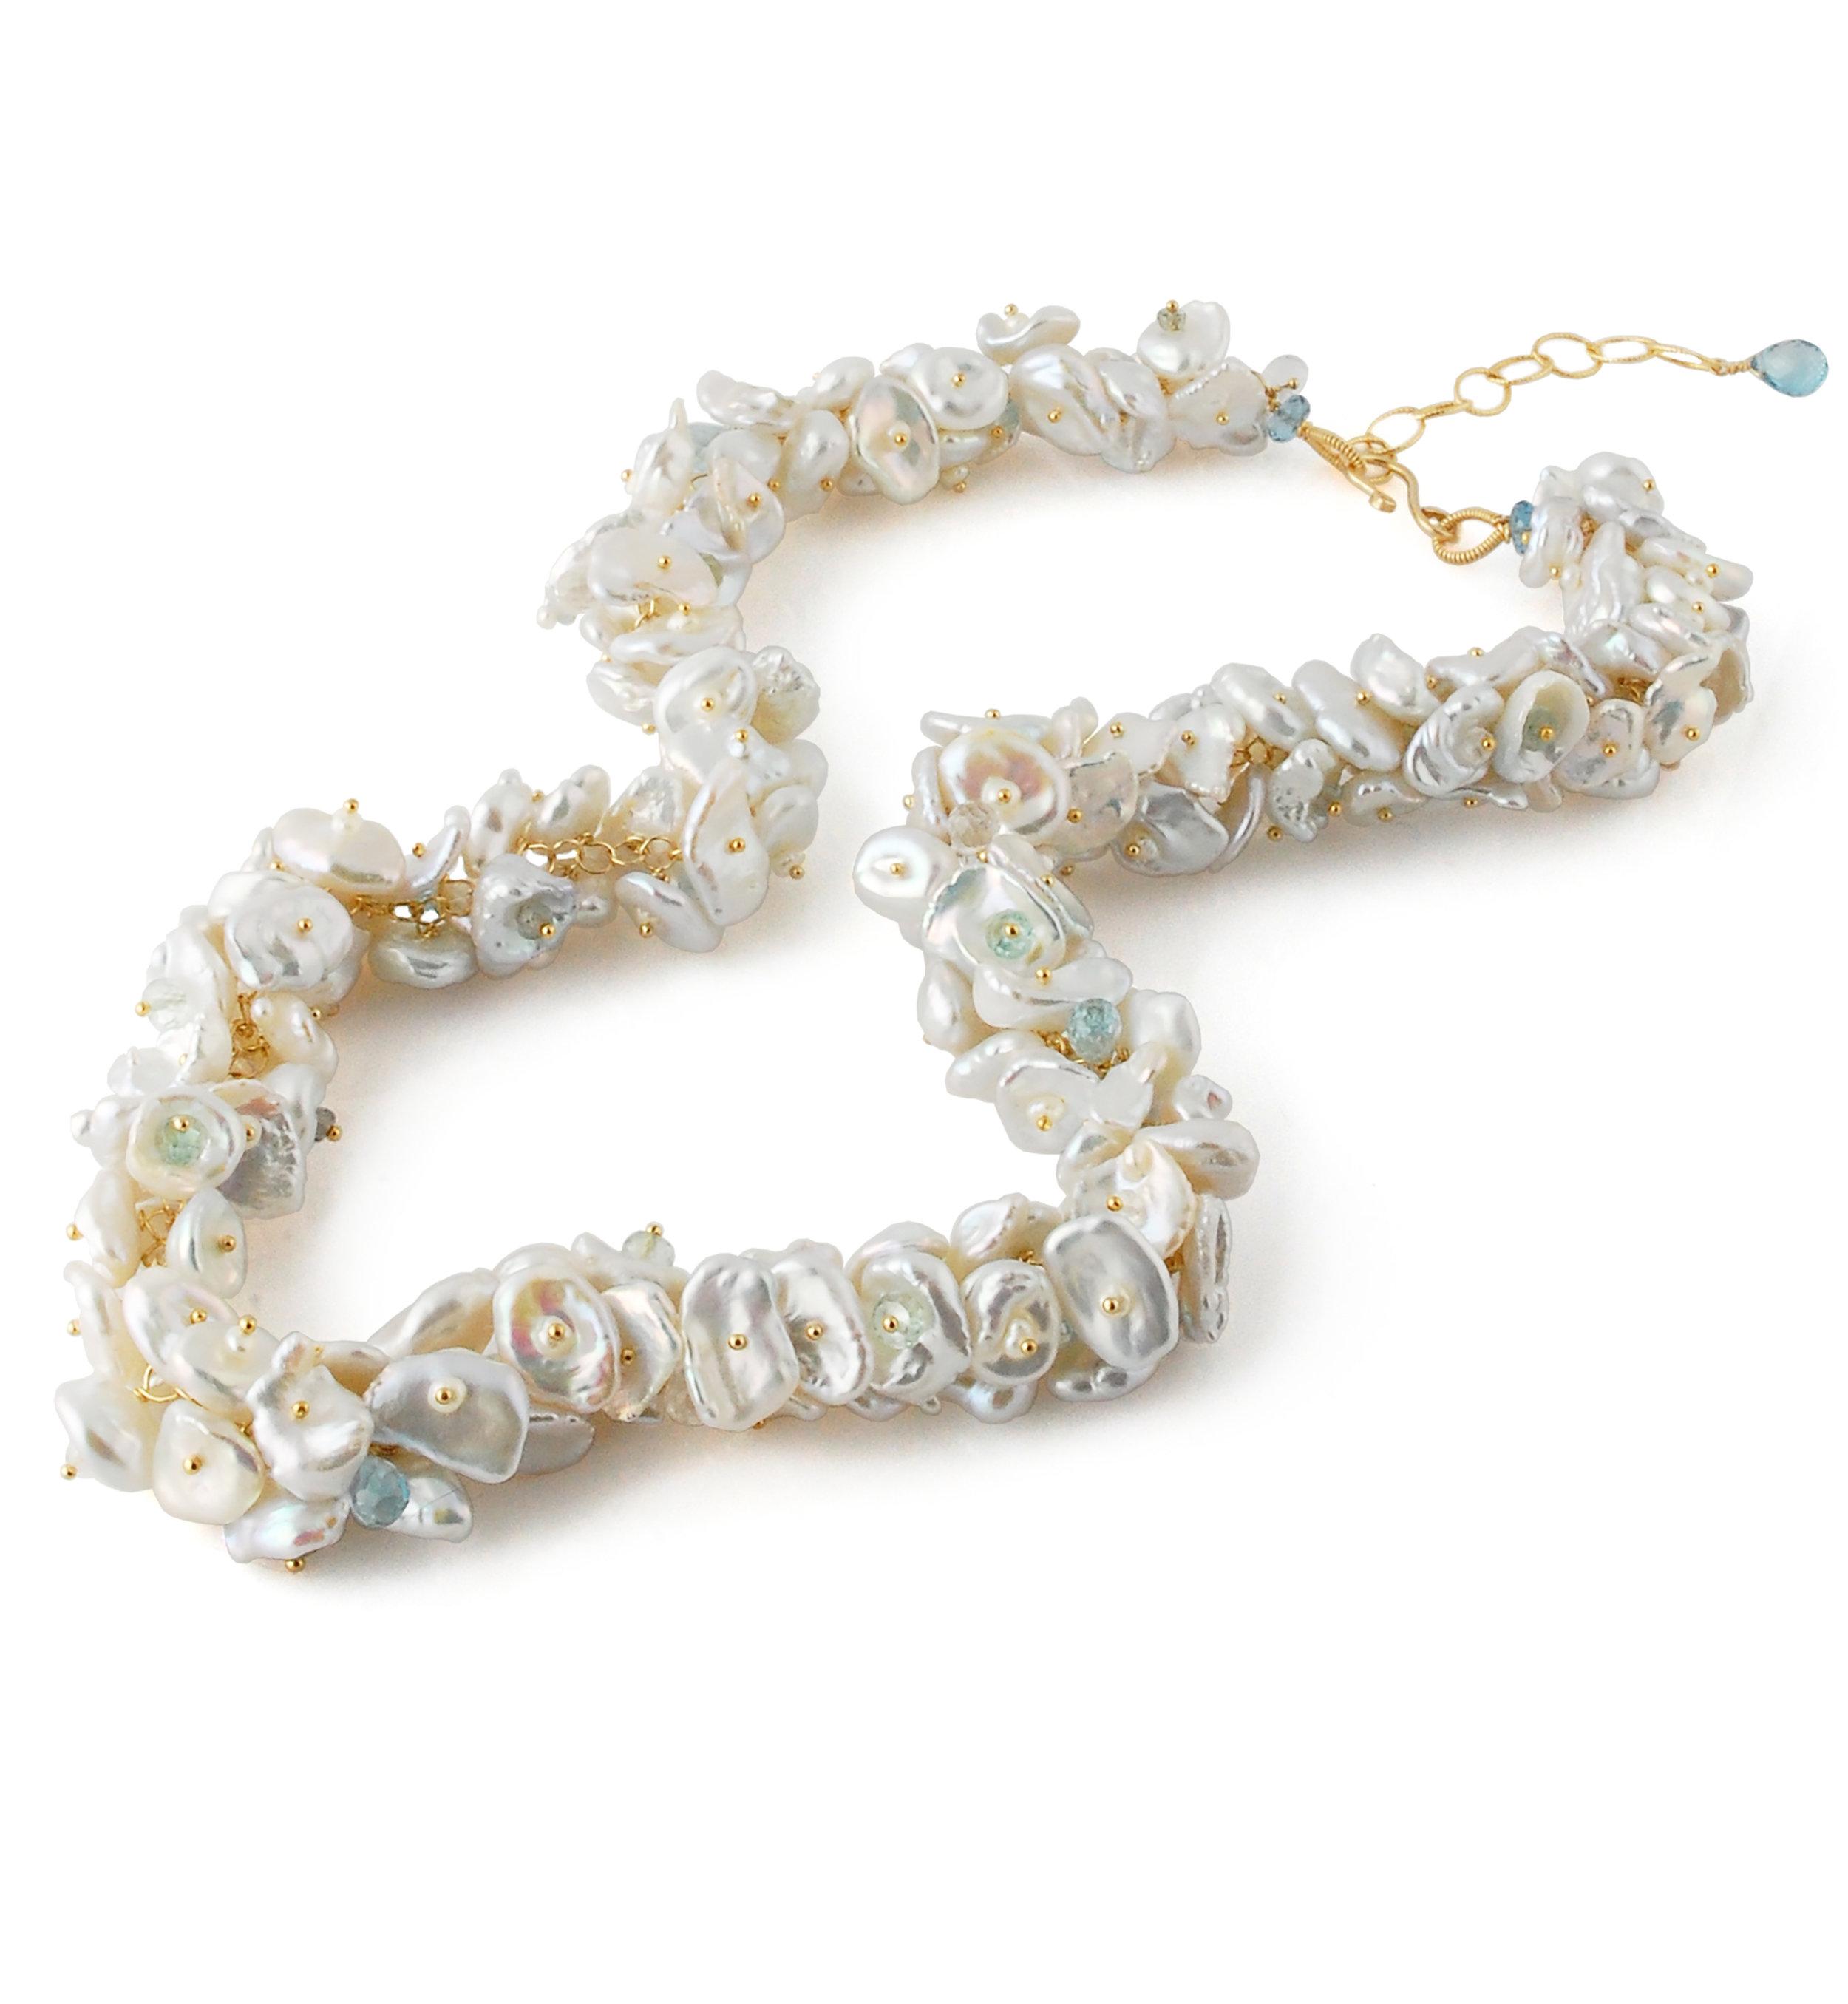 Main-Image-keishi-pearl-blue-topaz-necklace12.jpg